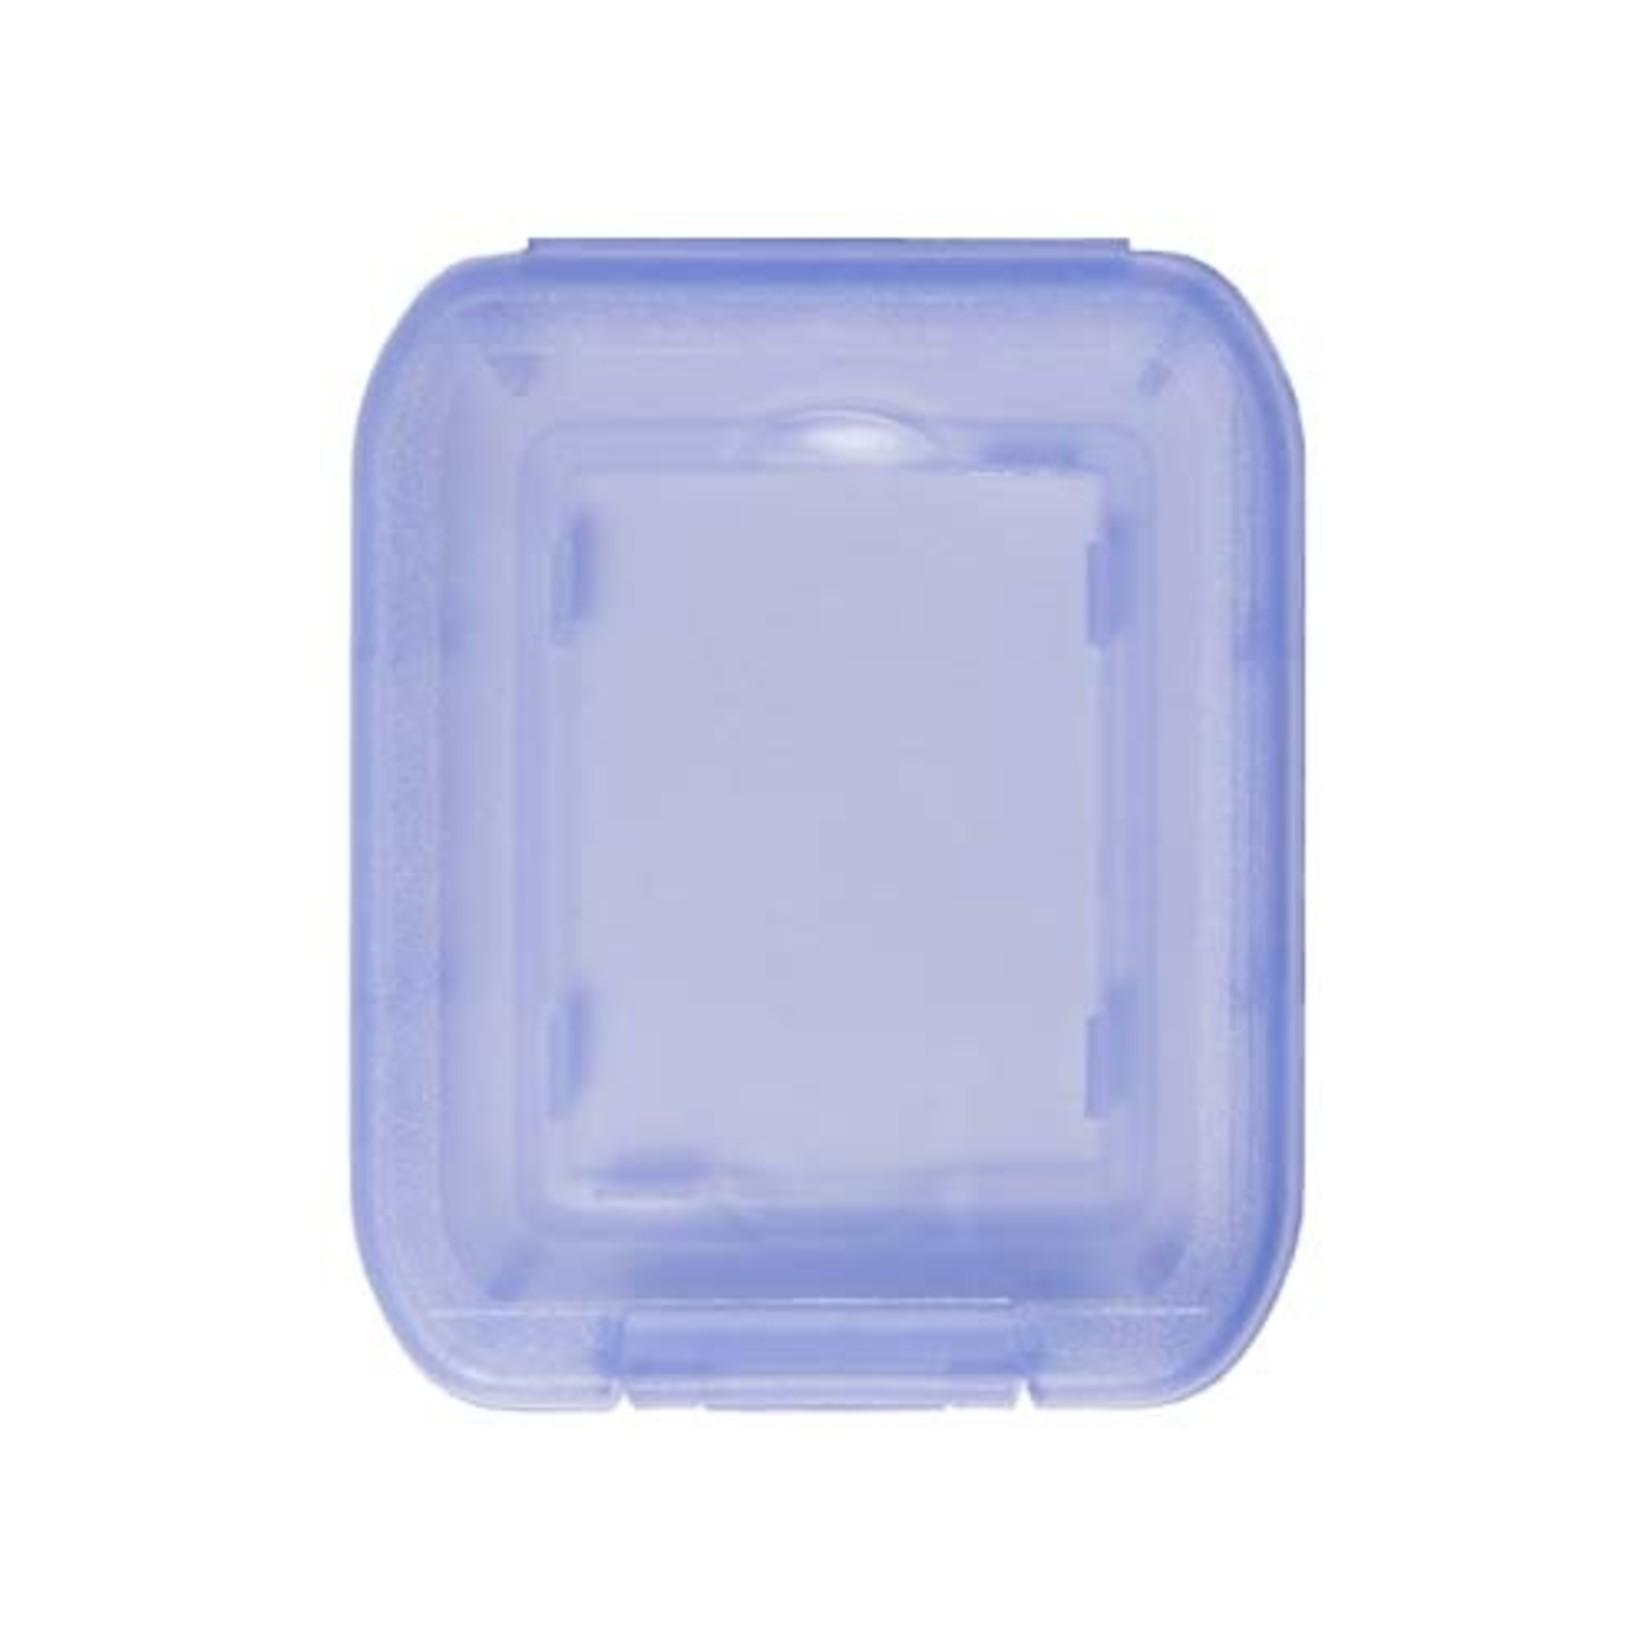 ProMaster Memory Card Storage Case - Single